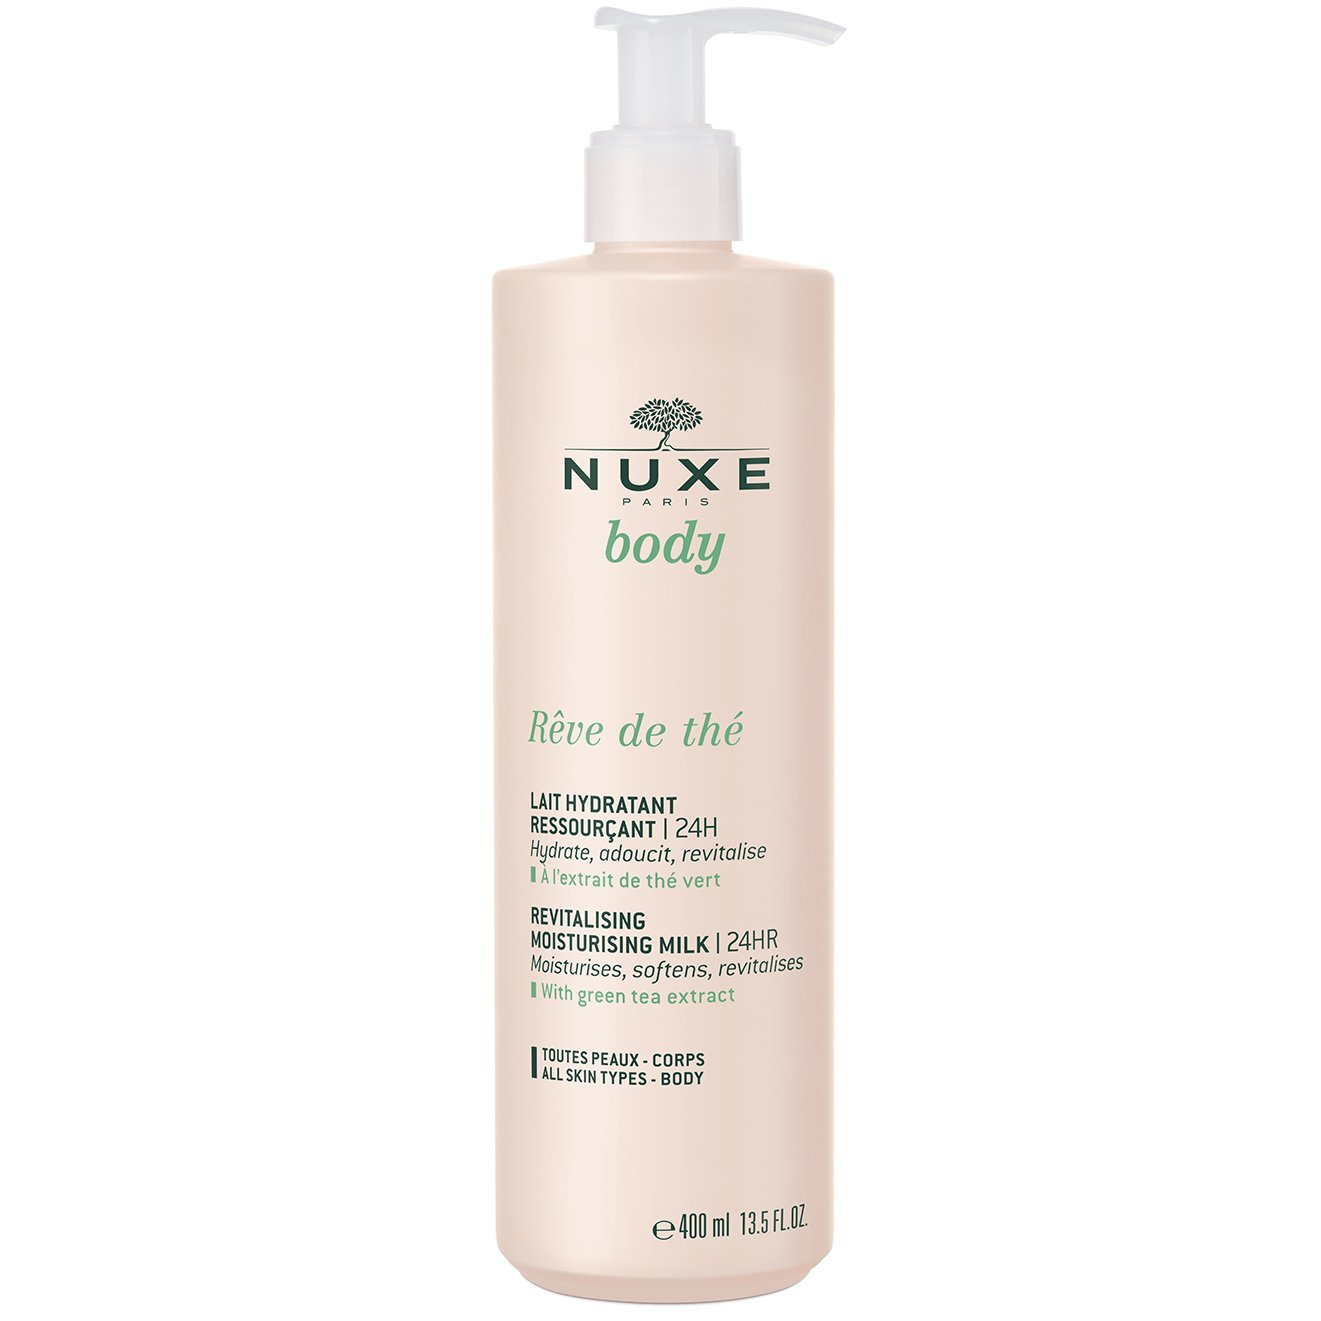 Nuxe Body Reve de The Revitalising & Moisturising Milk Αναζωογονητικό & Ενυδατικό Γαλάκτωμα Σώματος 400ml